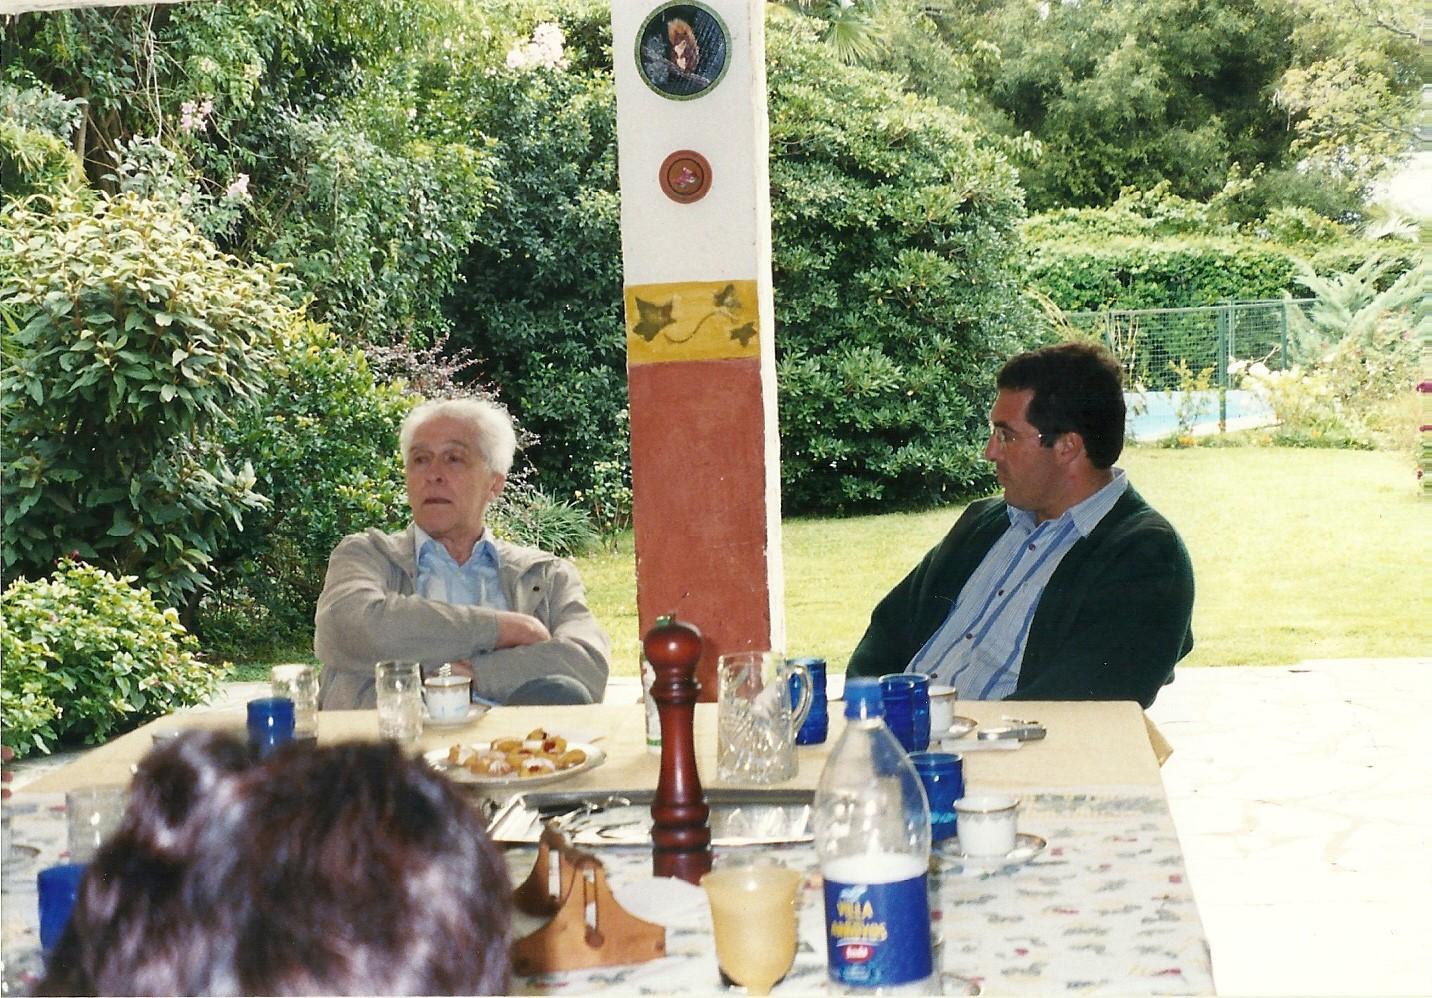 historiador Luiz Alberto Moniz Bandeira compatiendo un almuerzo junto a Marcelo Gullo